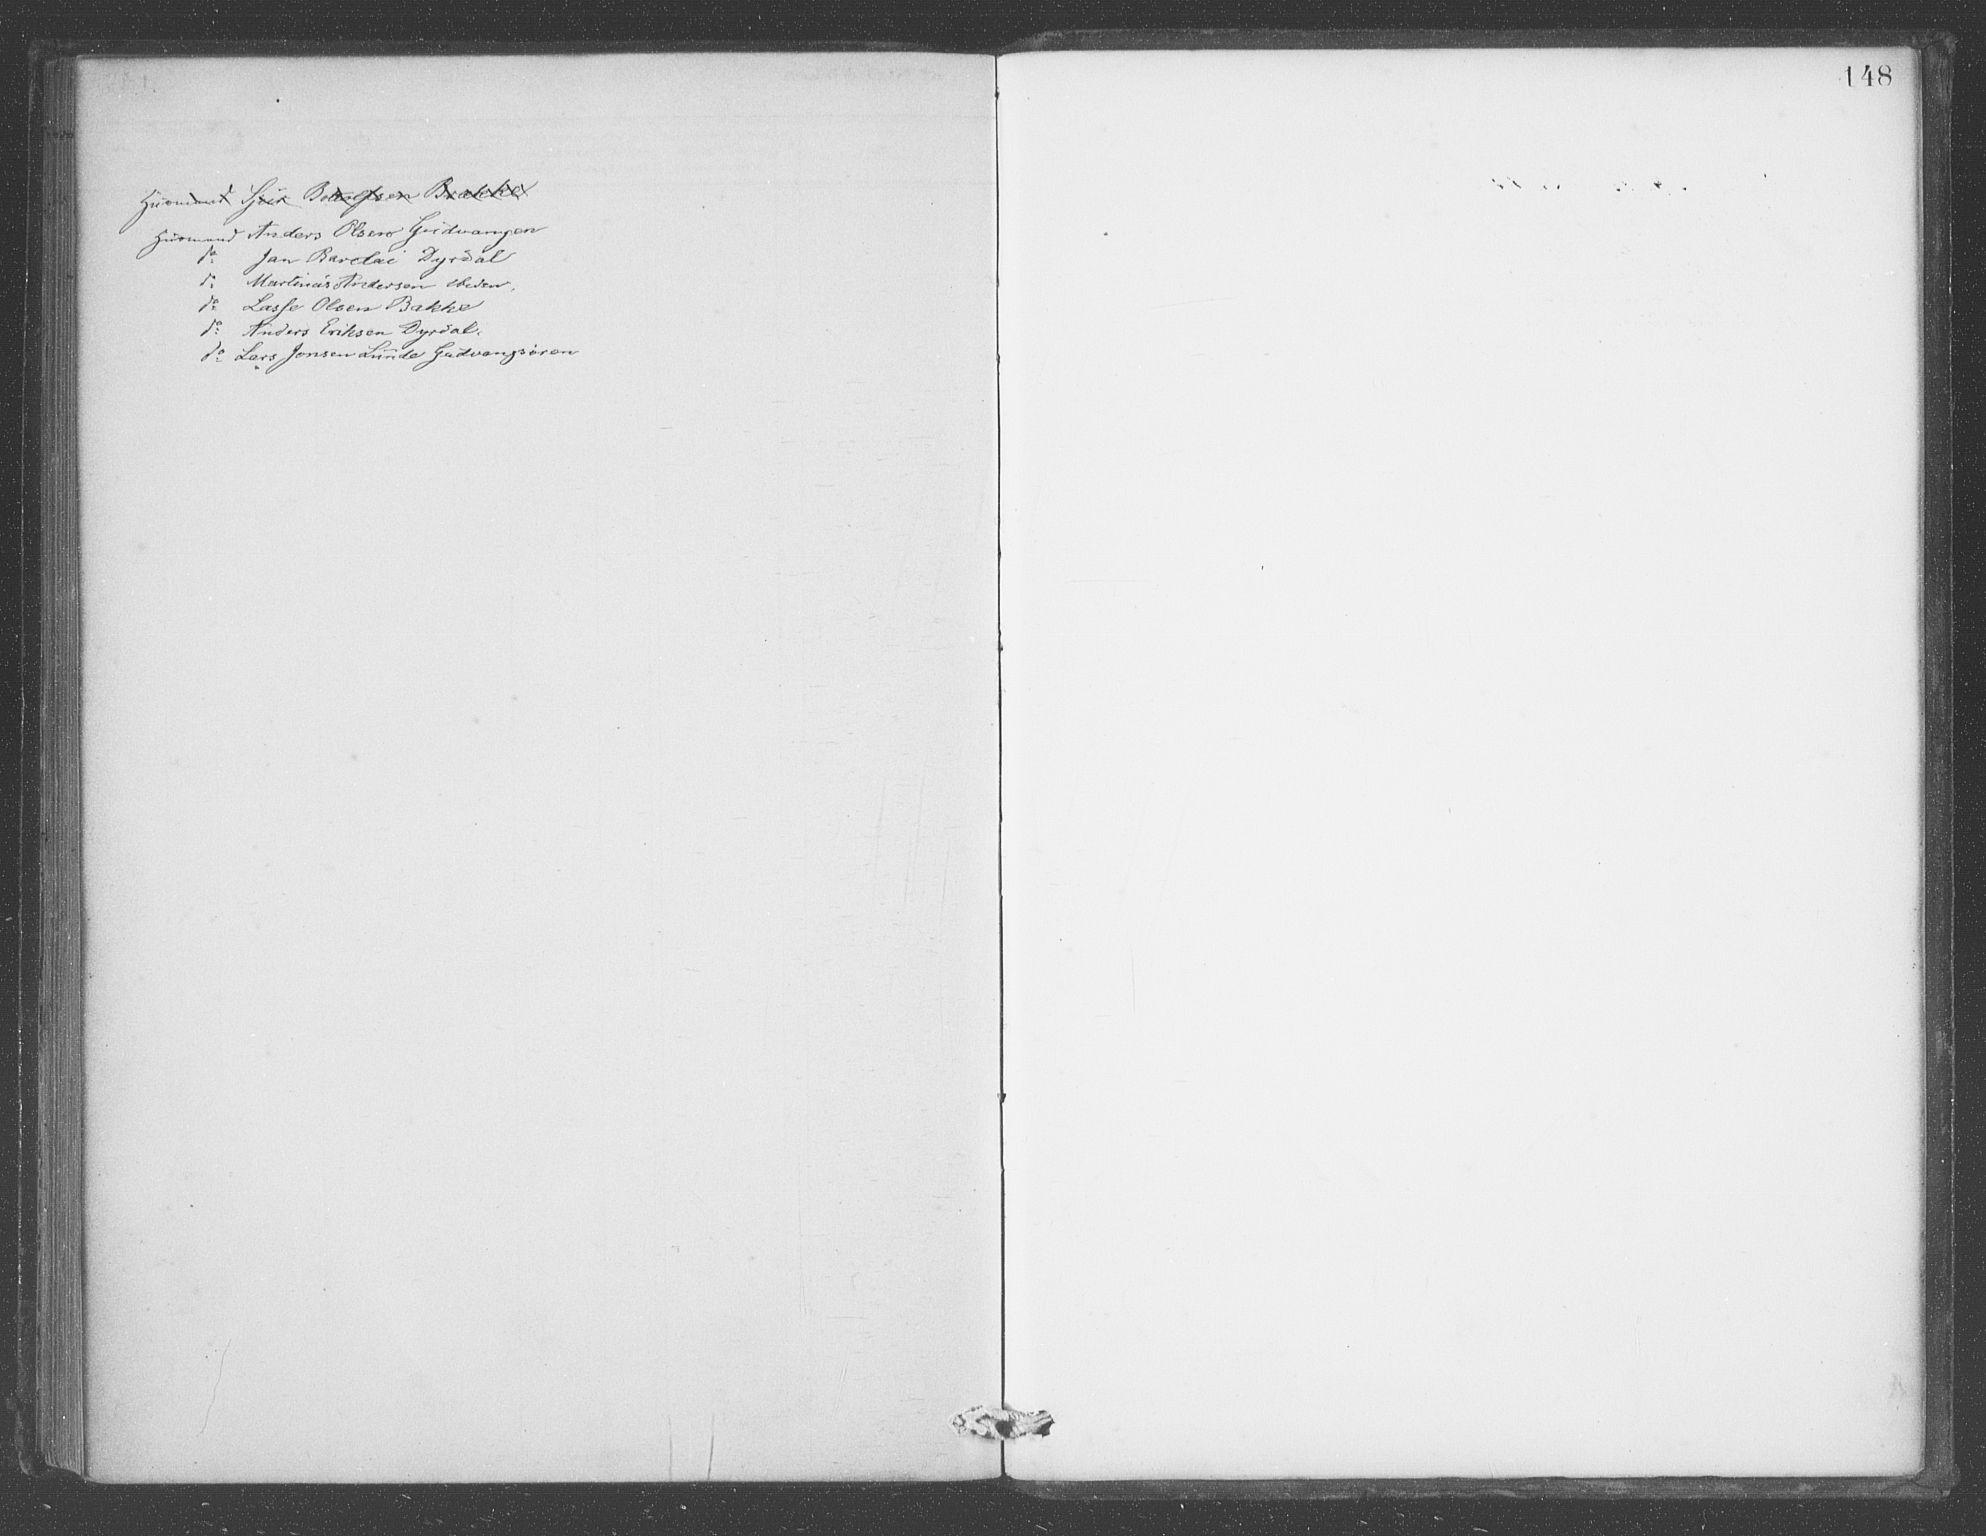 SAB, Aurland sokneprestembete, H/Ha/Had/L0001: Ministerialbok nr. D  1, 1880-1903, s. 148